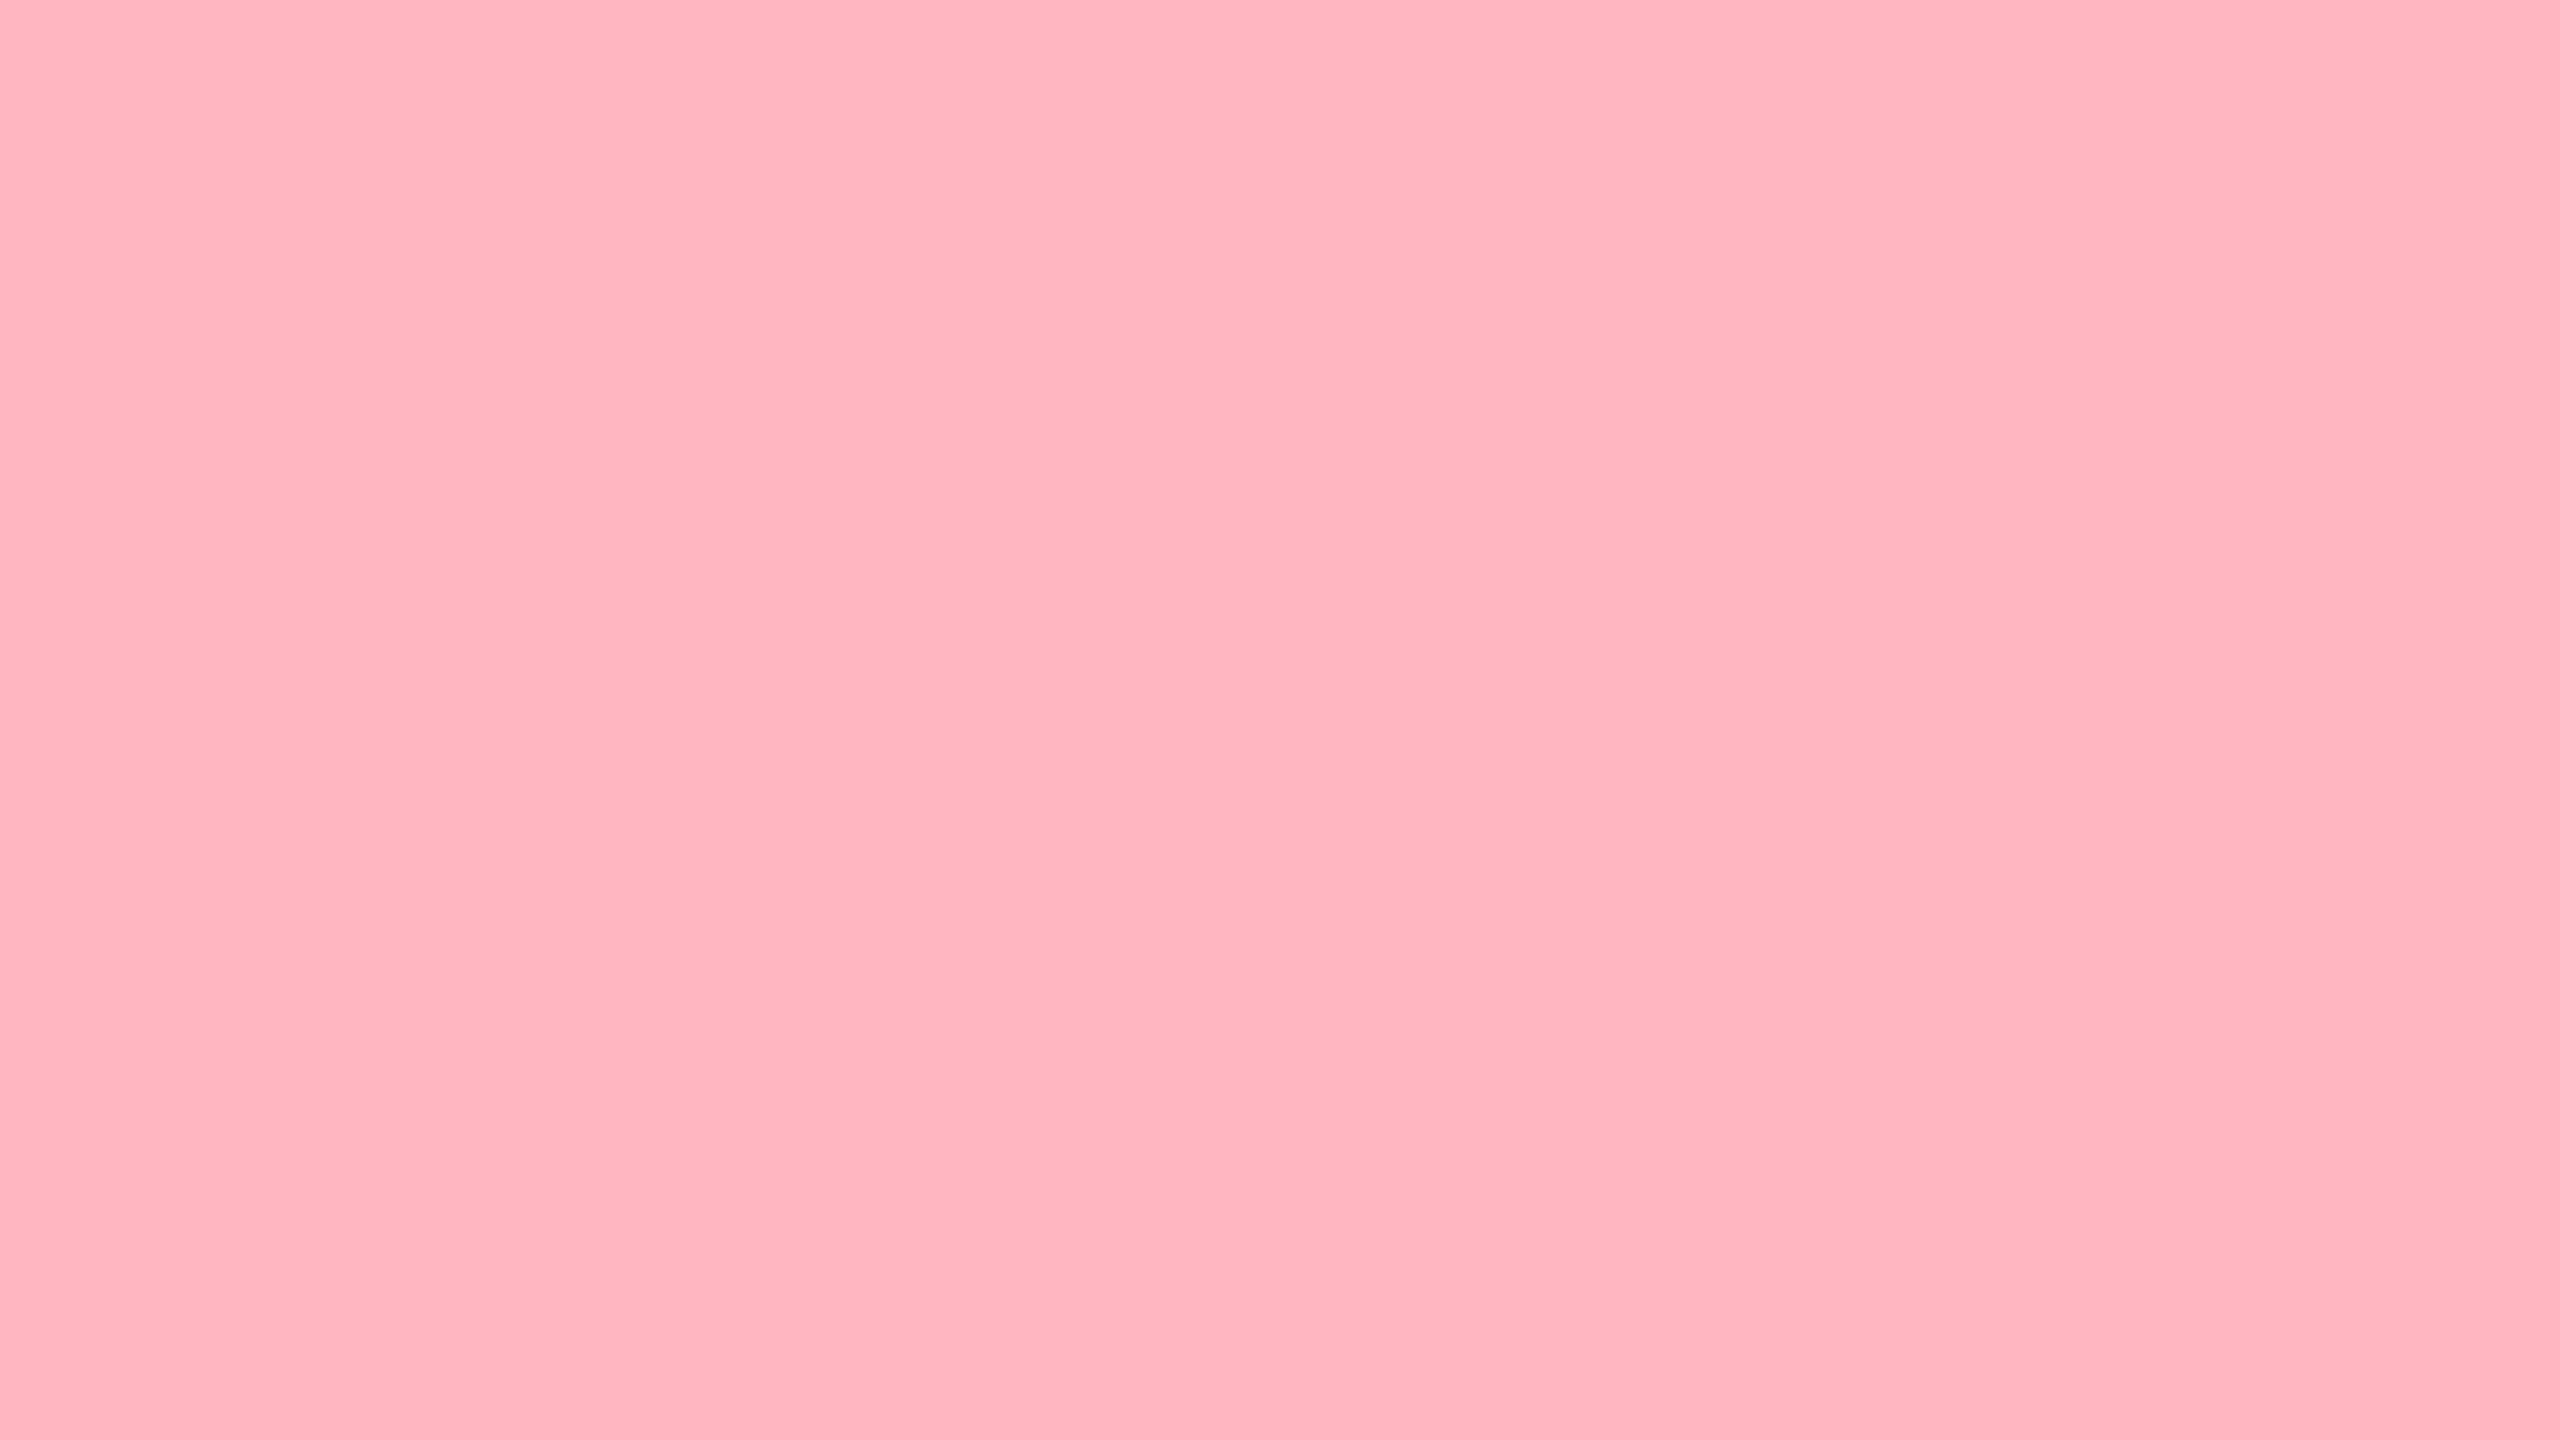 76 Light Pink Wallpapers On Wallpapersafari